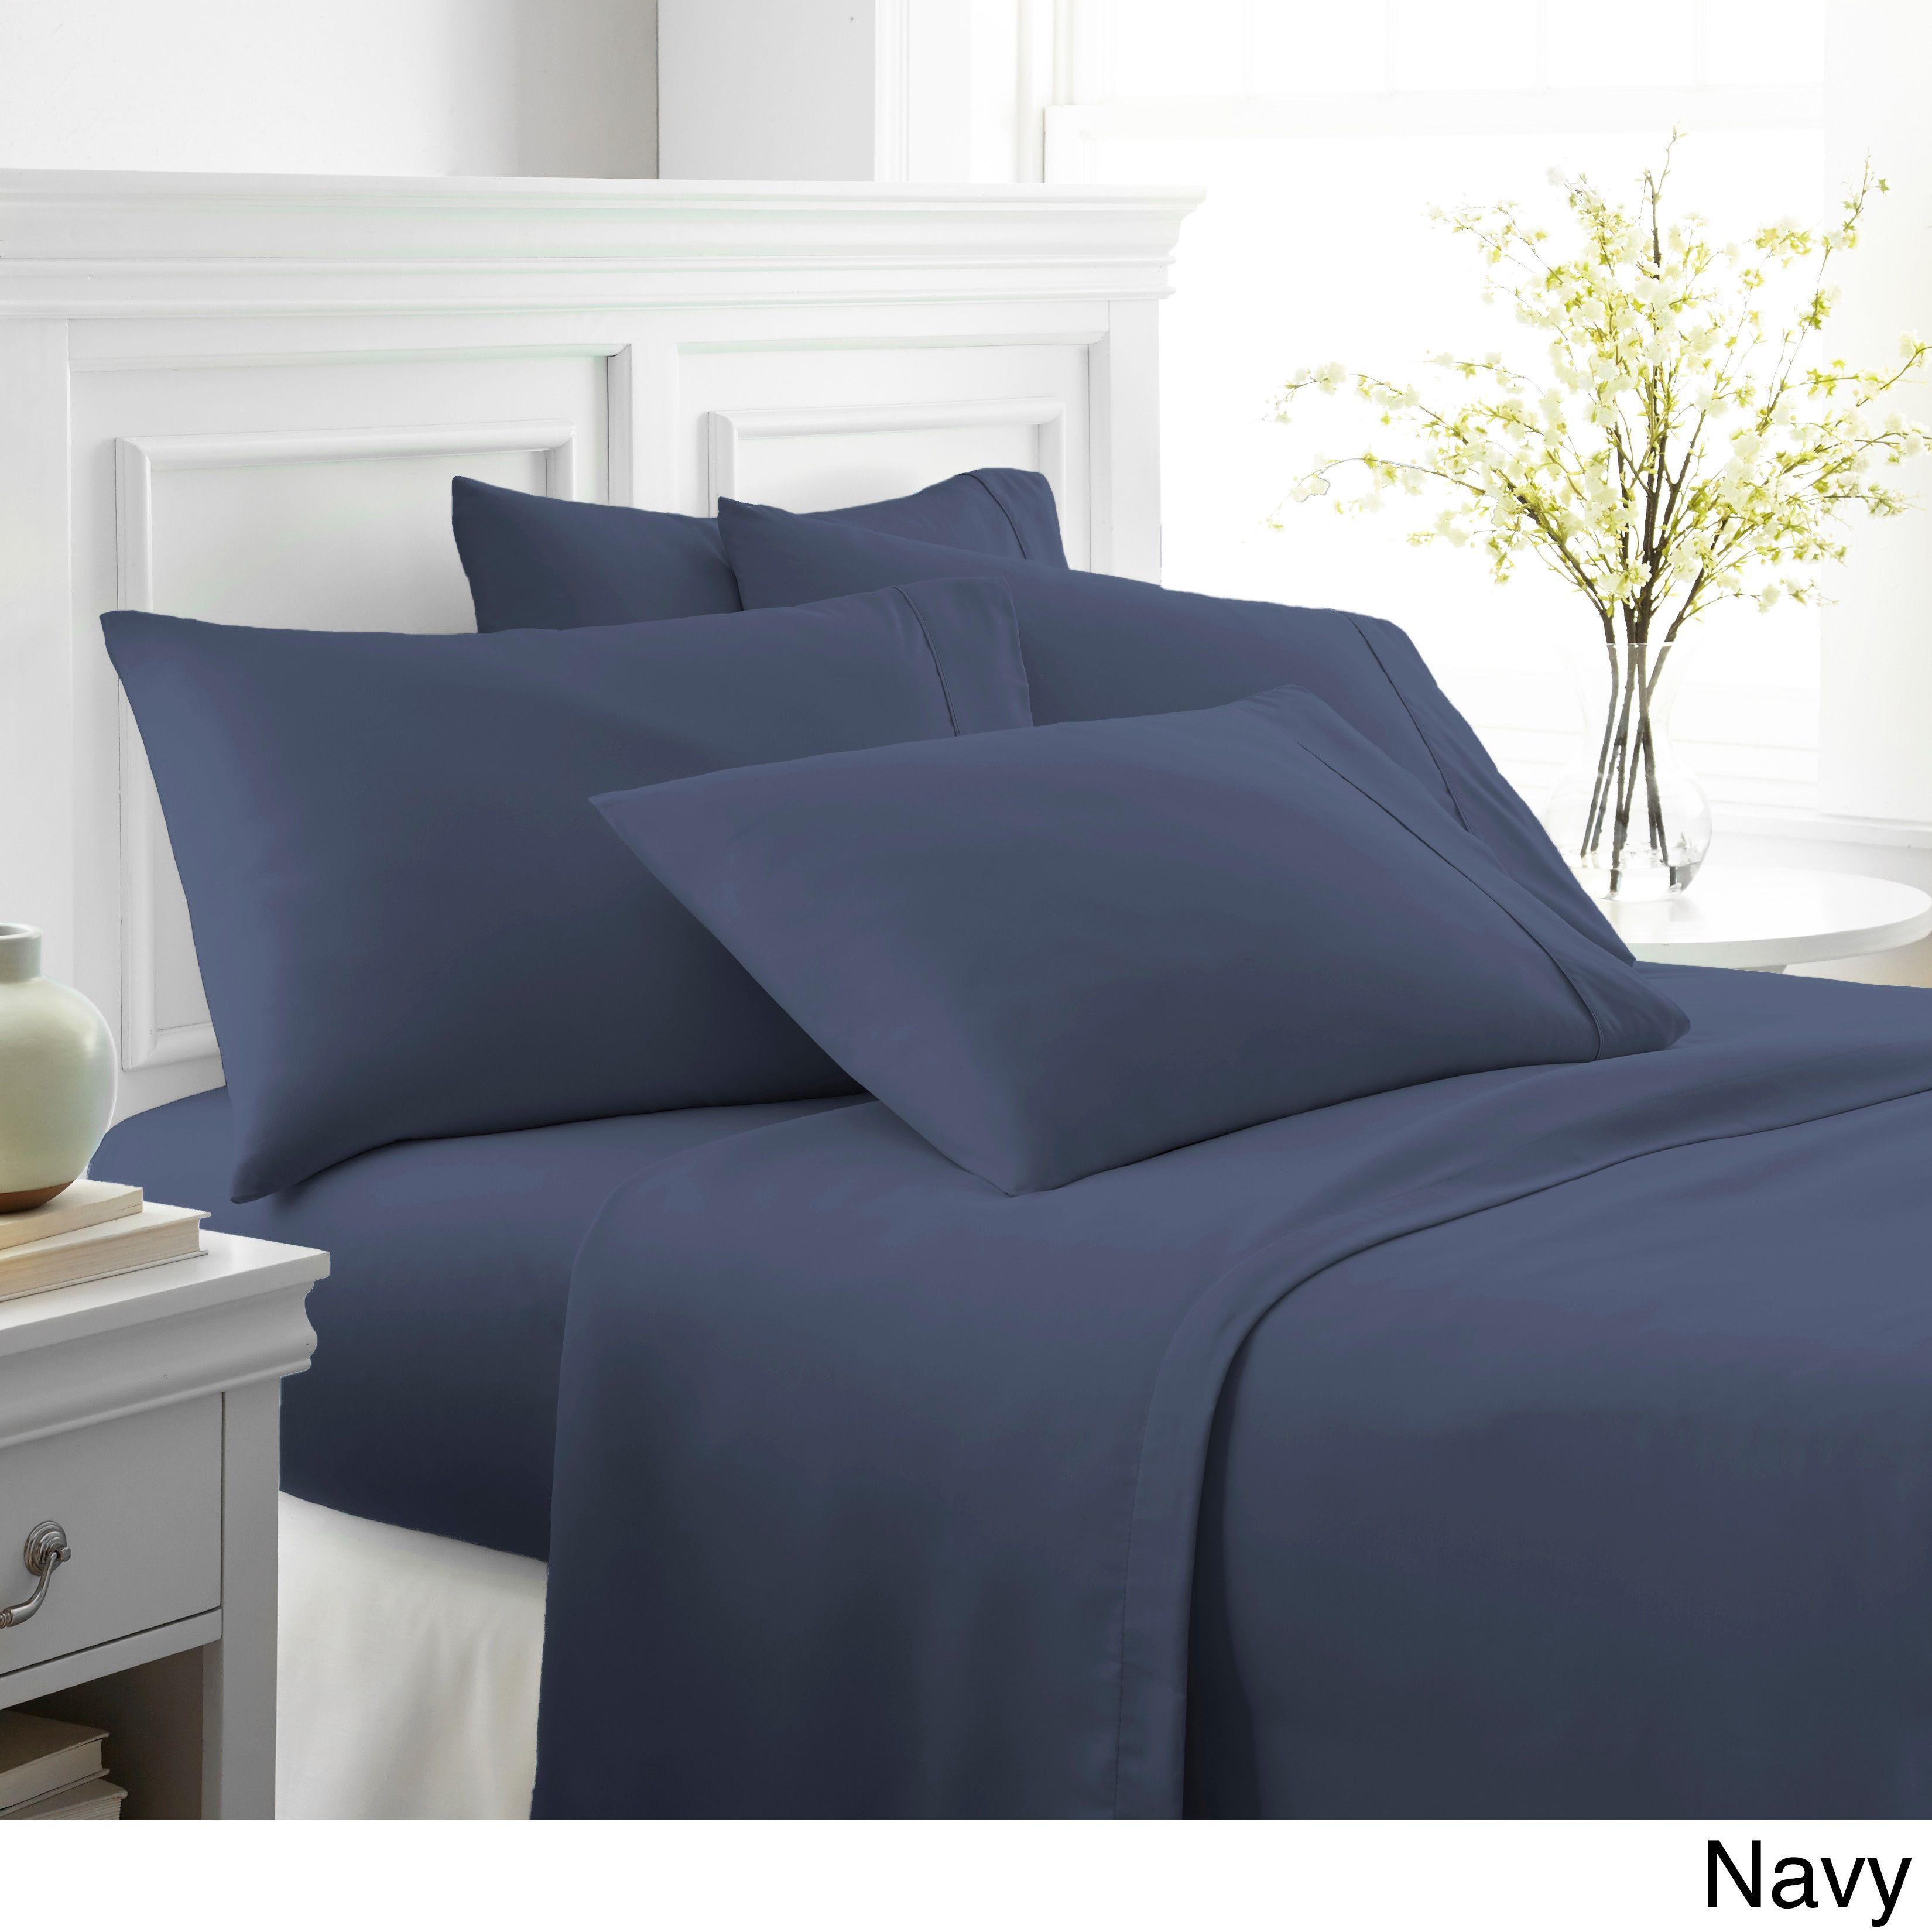 Merit Linens100 Percent Brushed 6 Piece Bed Sheet Set